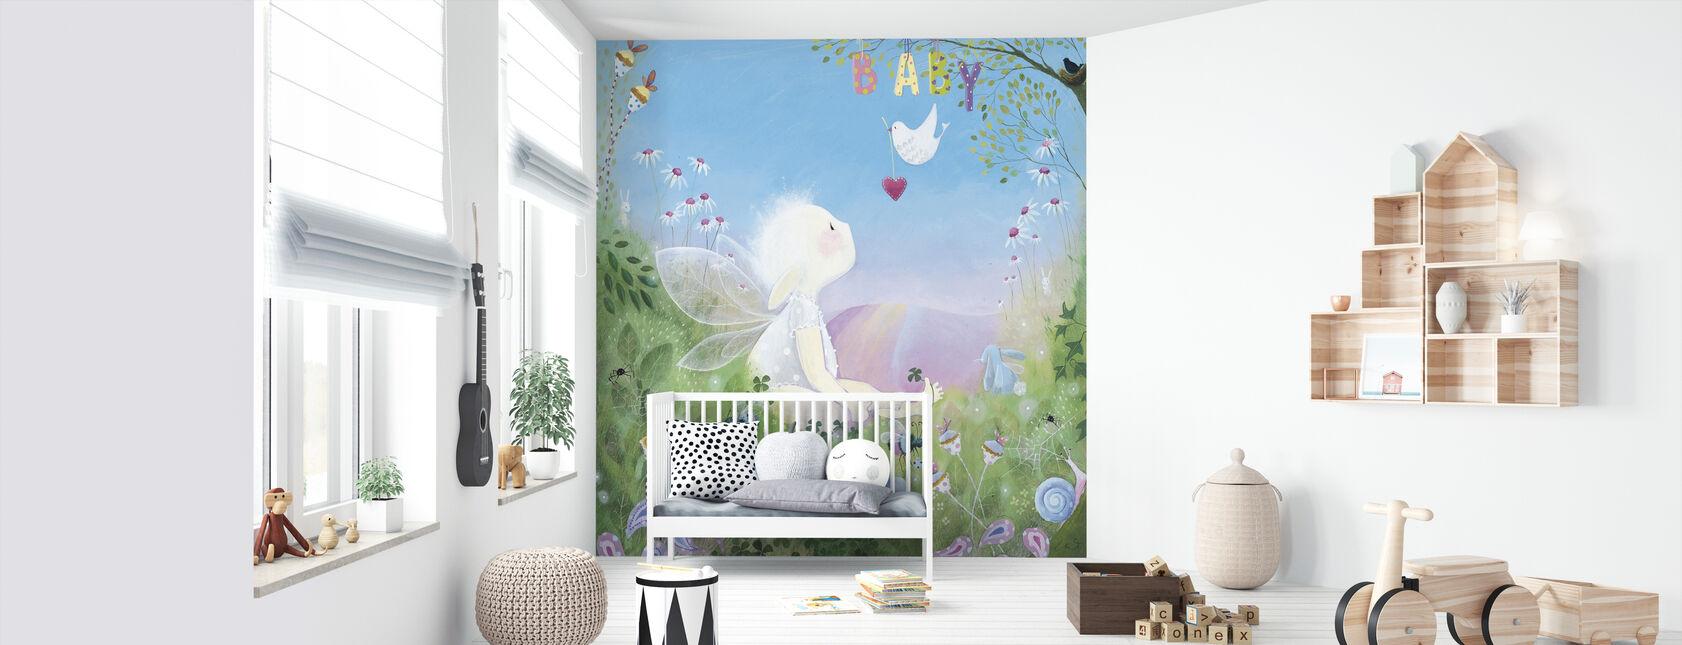 Baby - Wallpaper - Nursery